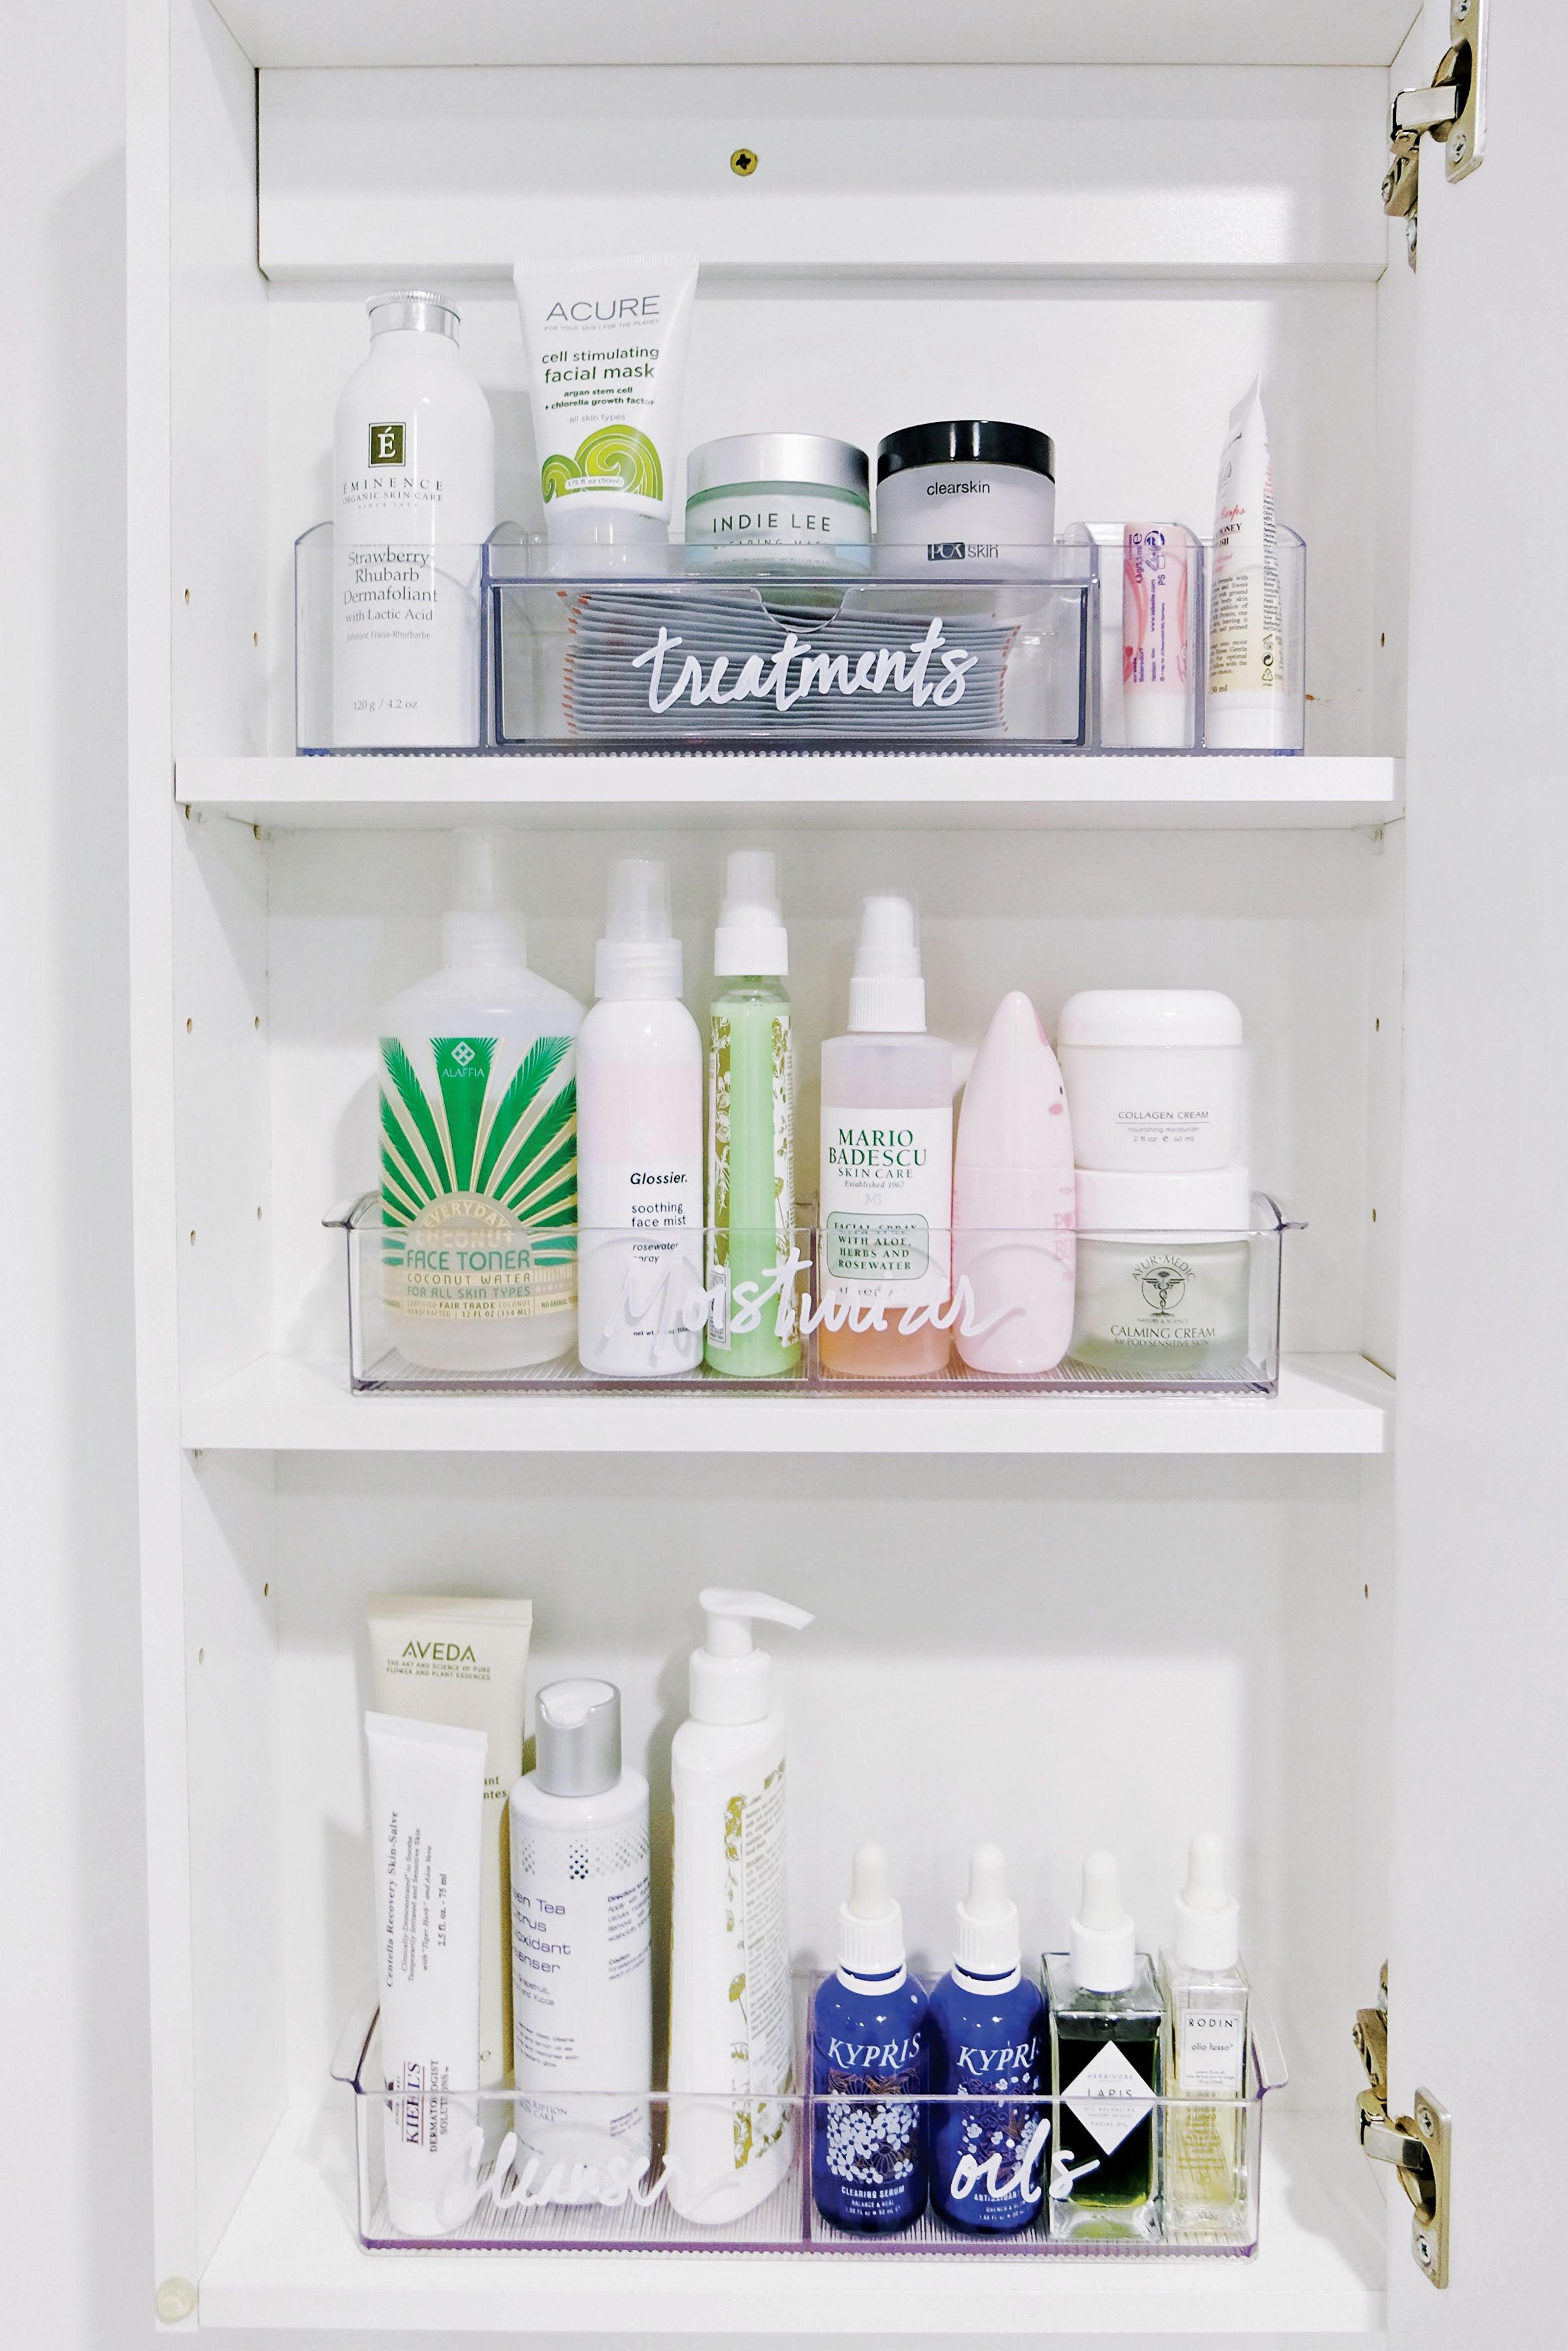 5 Bathroom Drawer Organization Ideas We Re Stealing From Pros